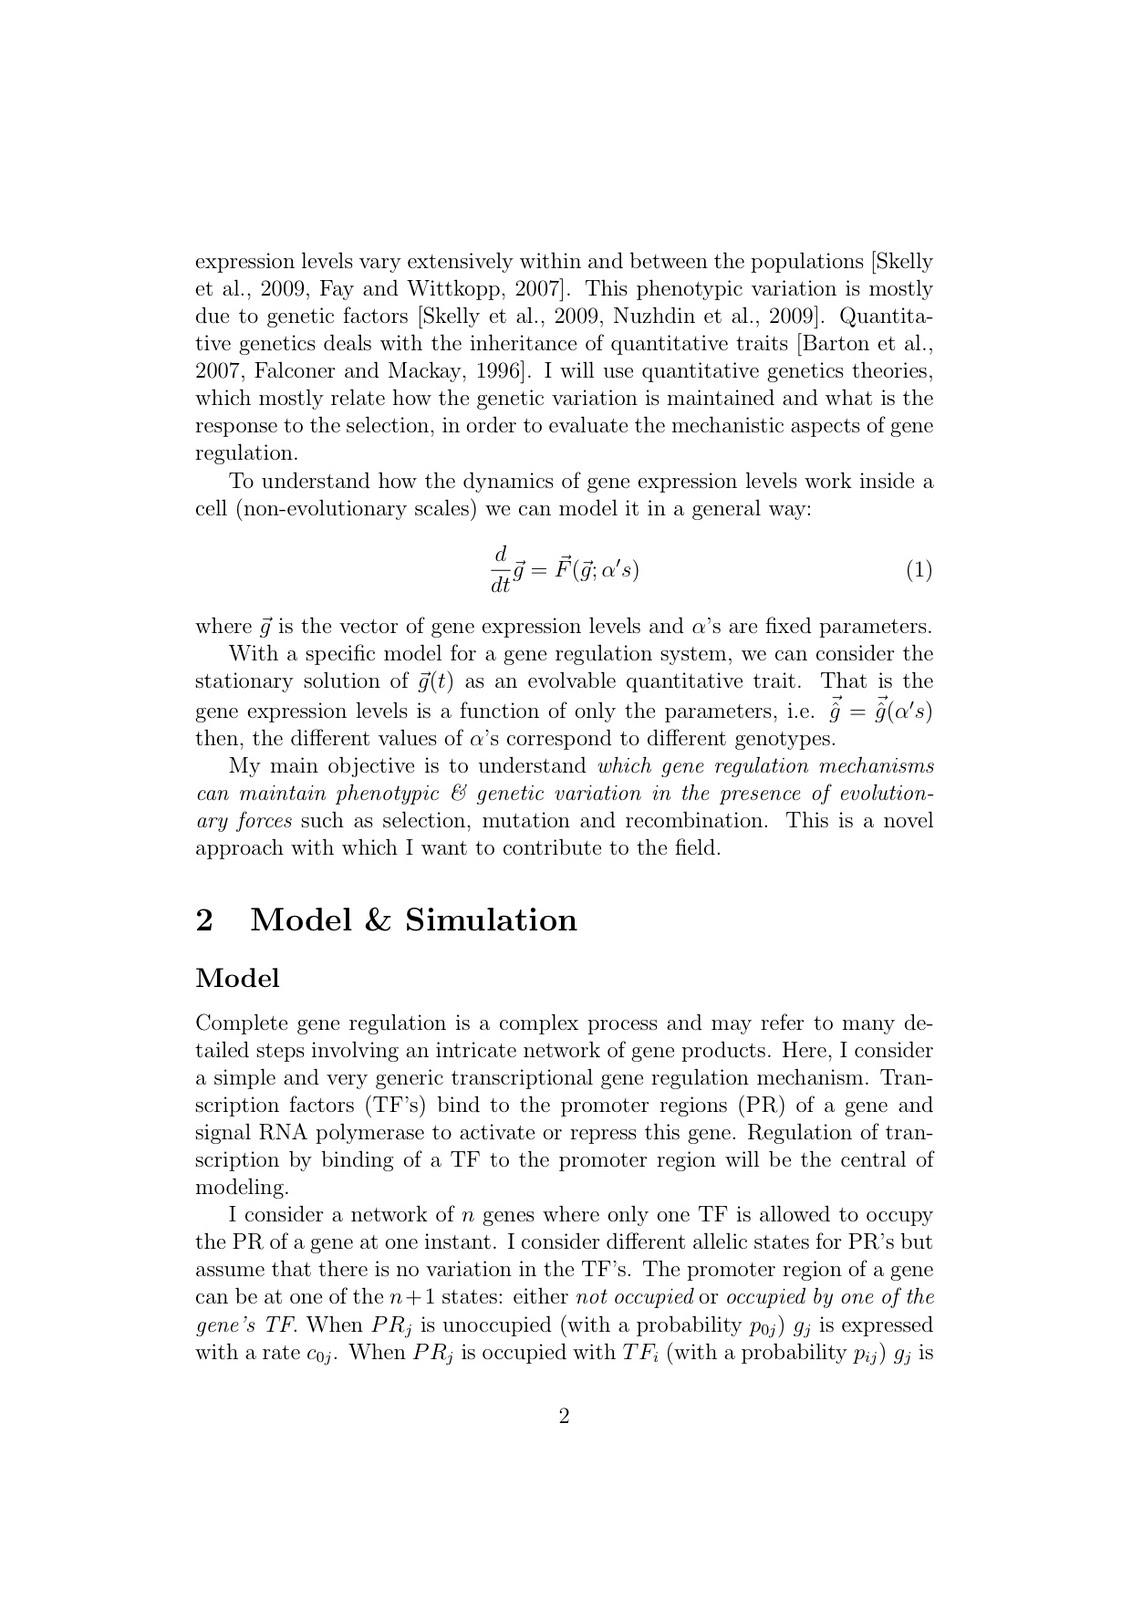 Process essay ornekleri